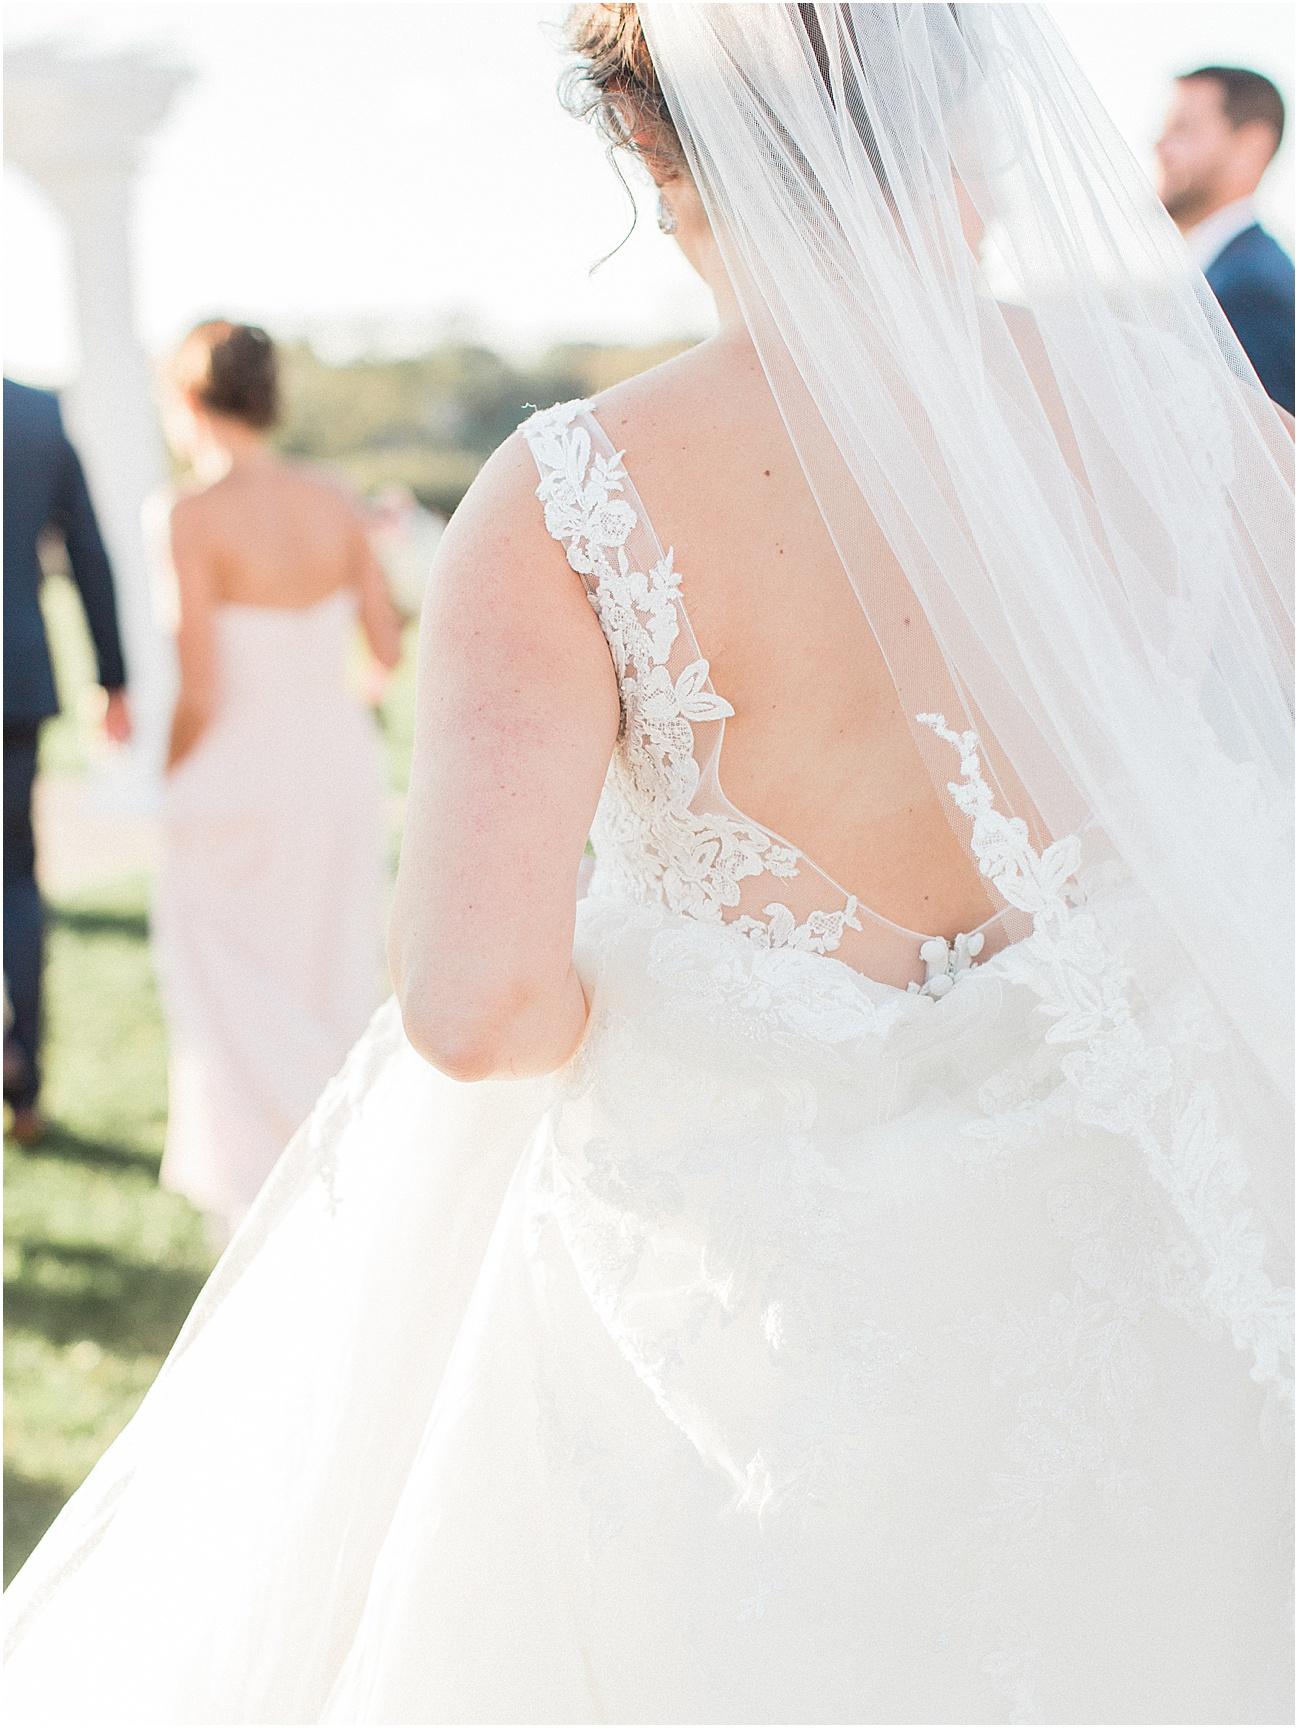 shannon_daniel_dan_atlantic_resort_saint_marys_st_mary_church_fall_newport_catholic_irish_cape_cod_boston_wedding_photographer_meredith_jane_photography_photo_1633.jpg